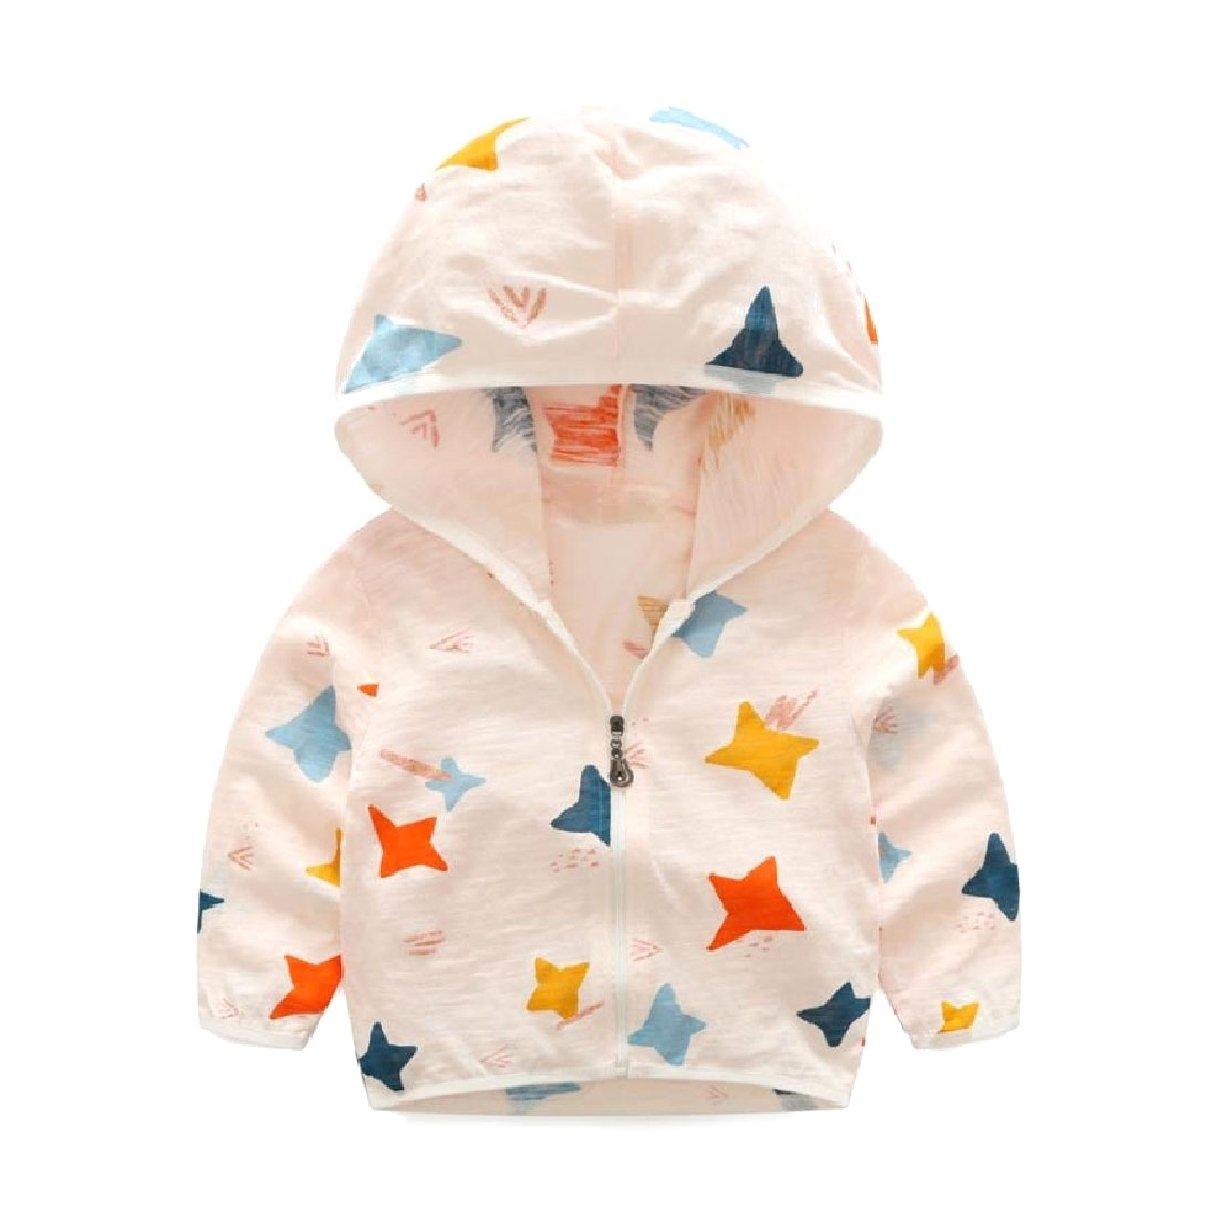 Zago Baby Boys Girls Zip up Sun Protection Lightweight Cozy Hoodies